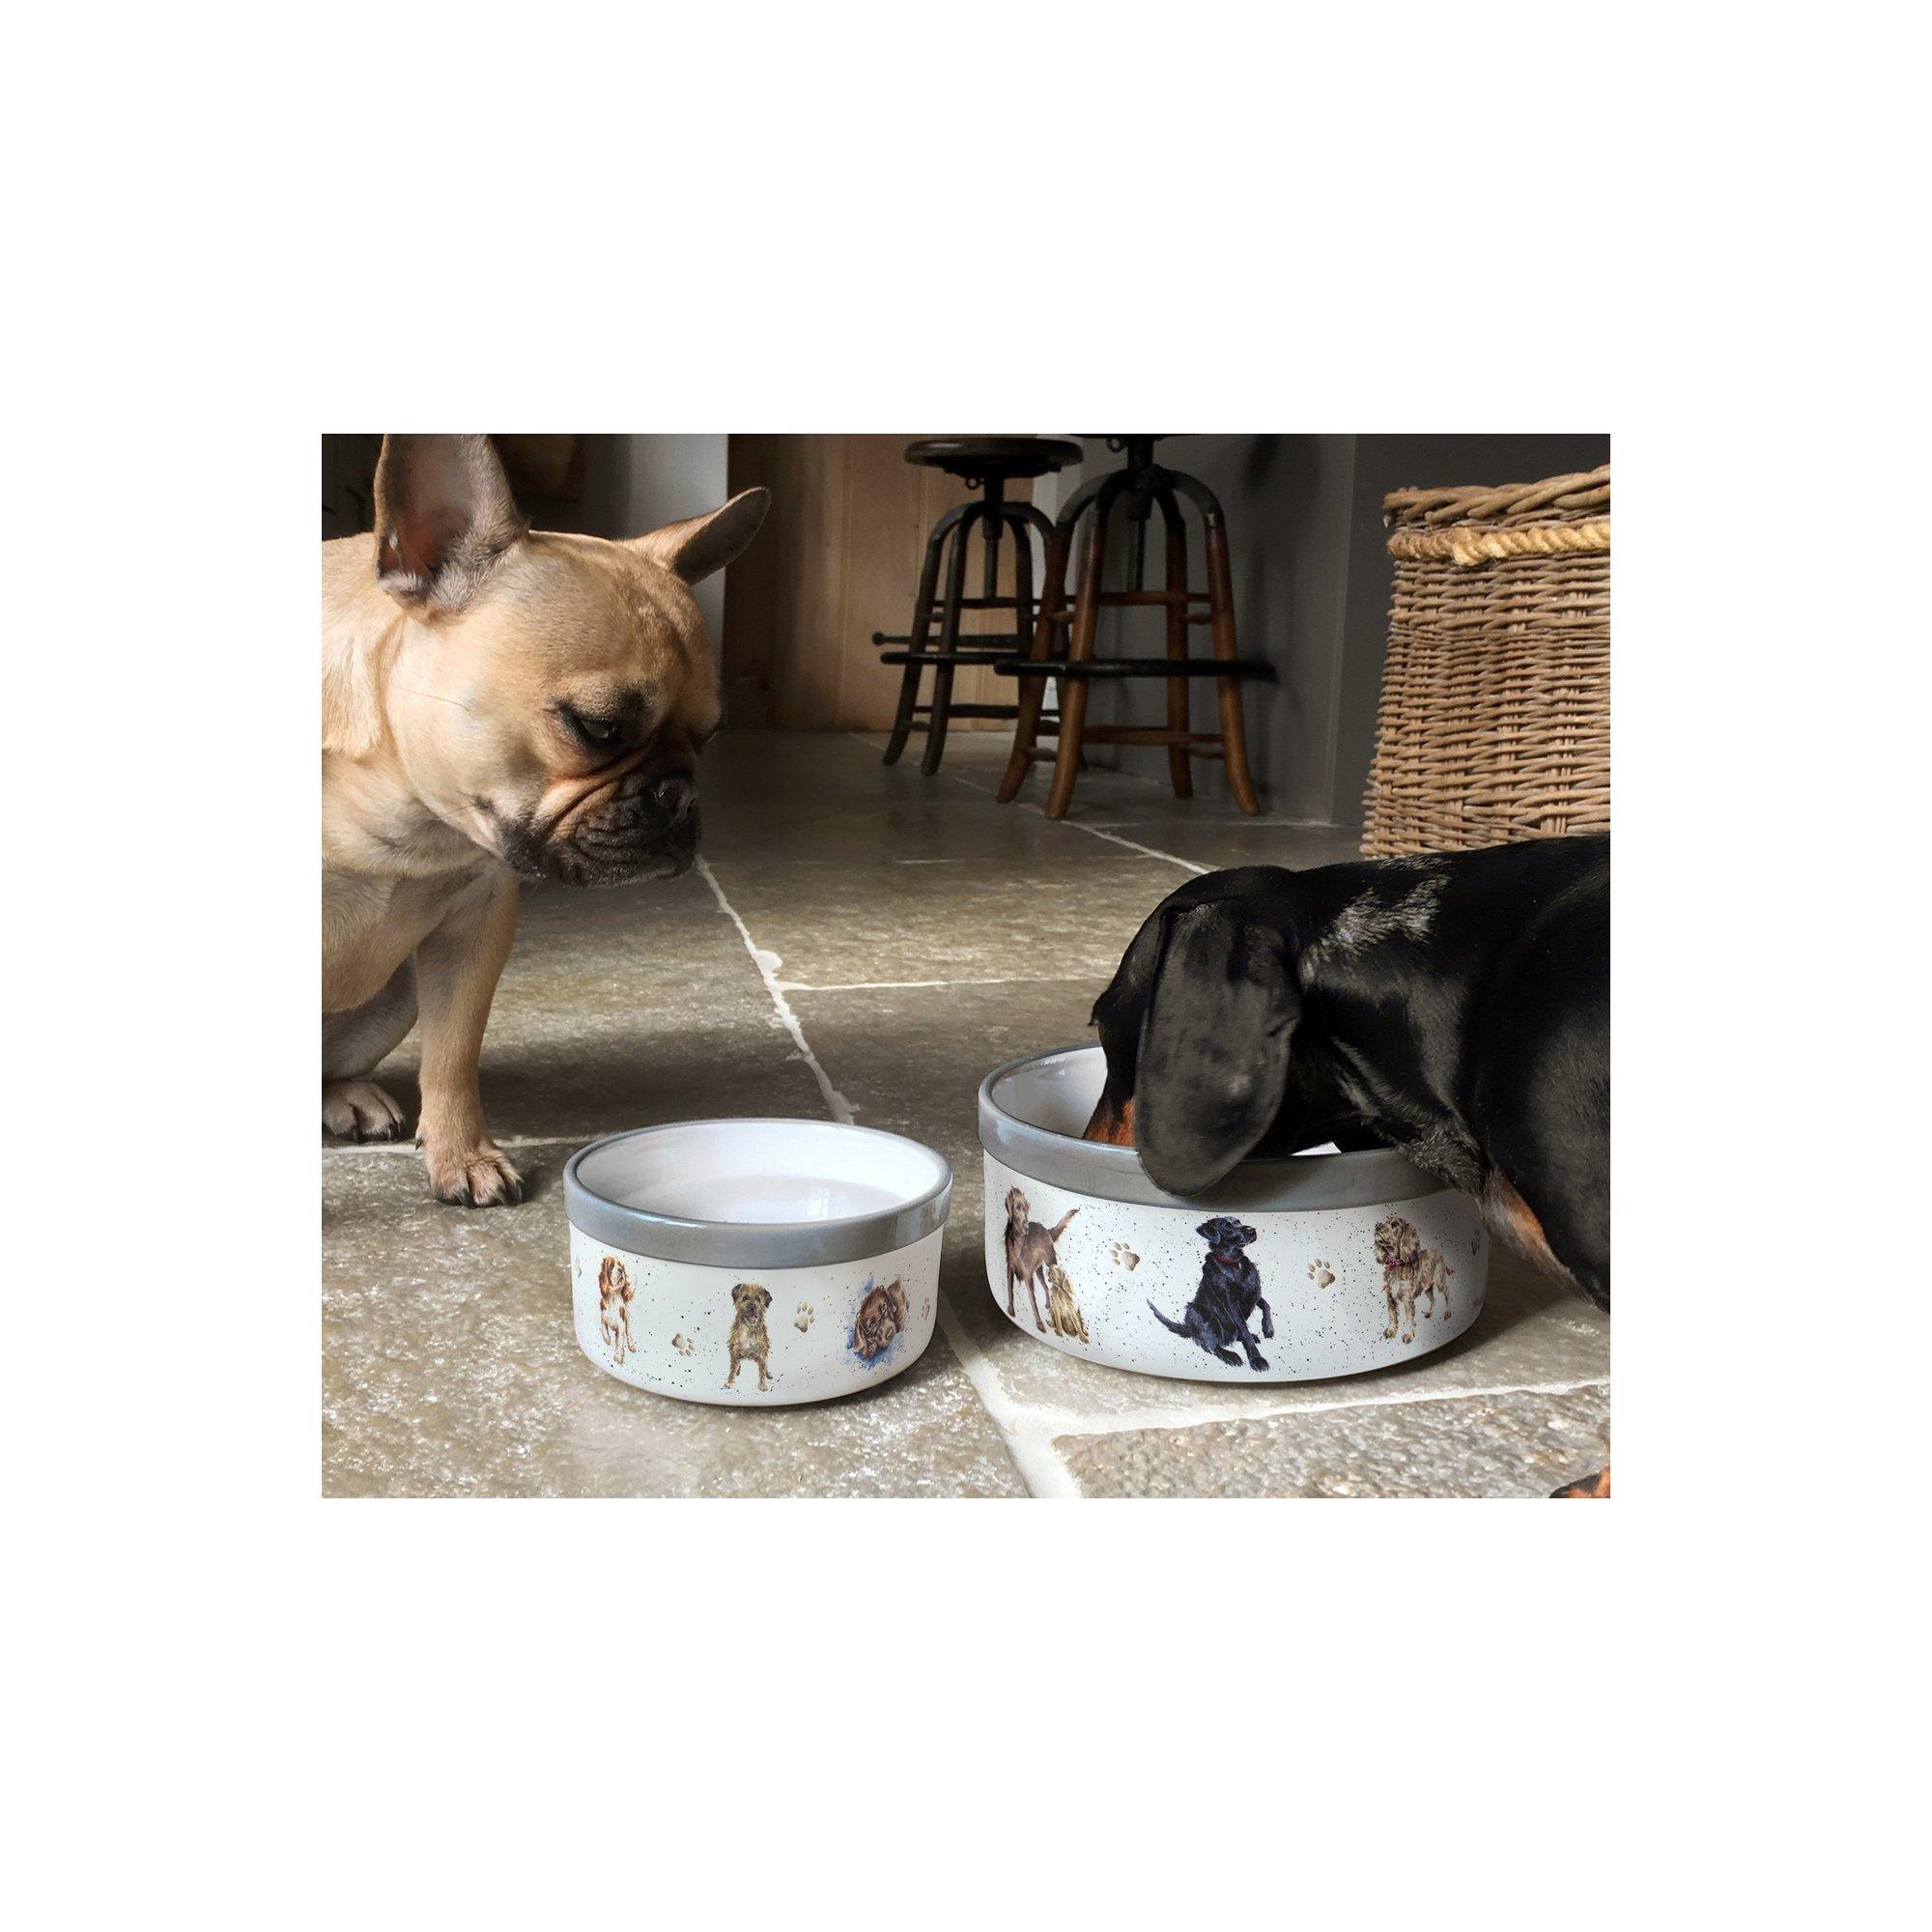 Image of Royal Worcester Wrendale Pet Bowl 6 Inch